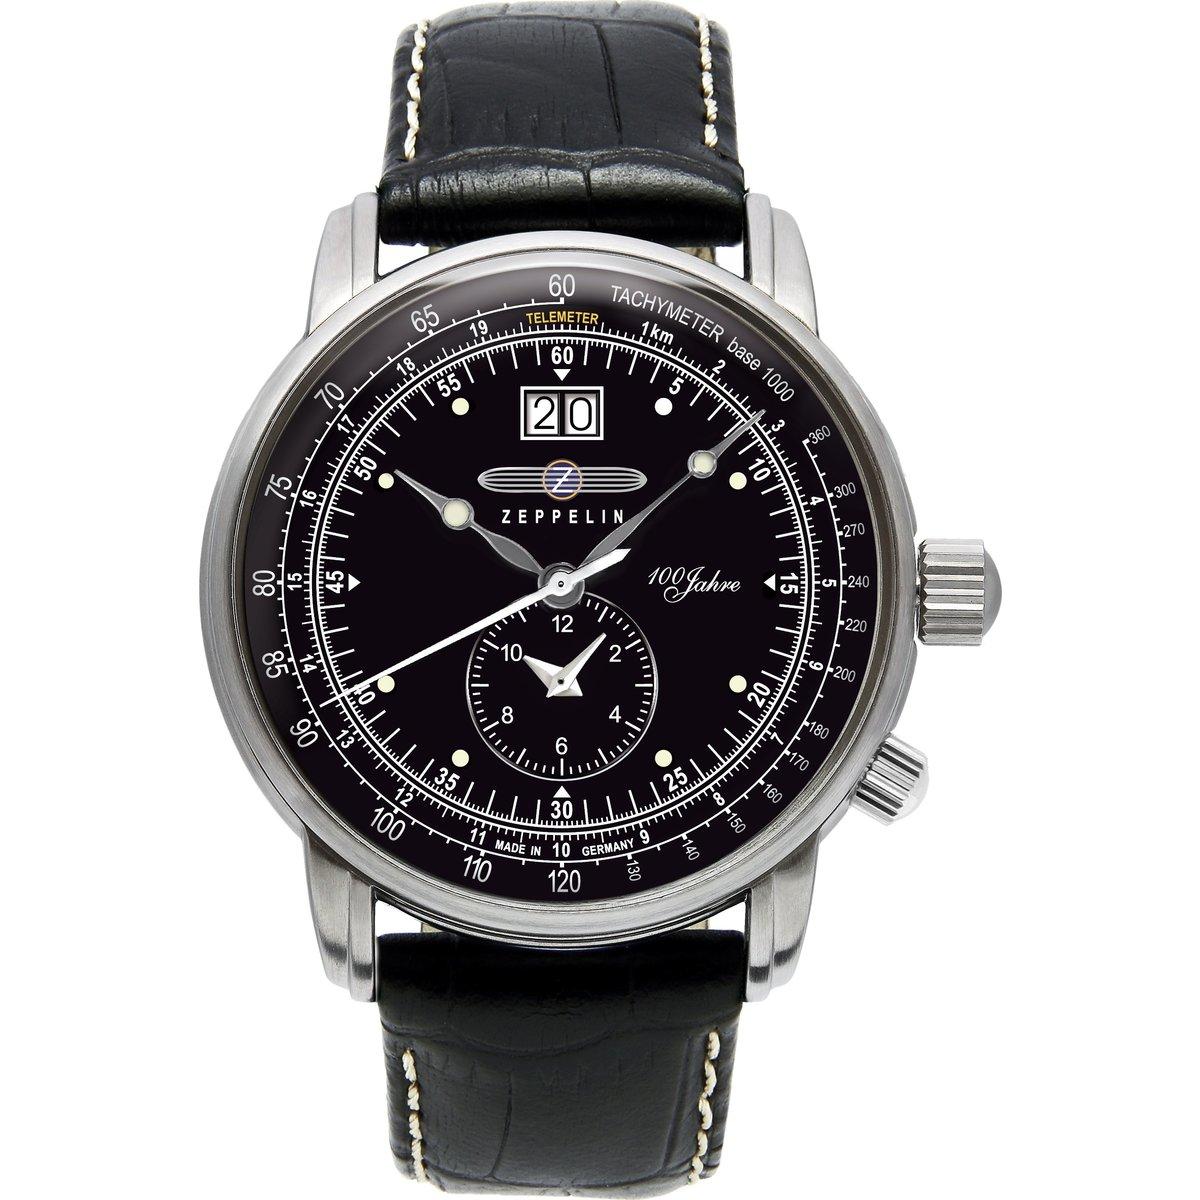 ZEPPELIN ツェッペリン 7640-2 メンズ 時計 腕時計 プレゼント ギフト 贈り物[あす楽]